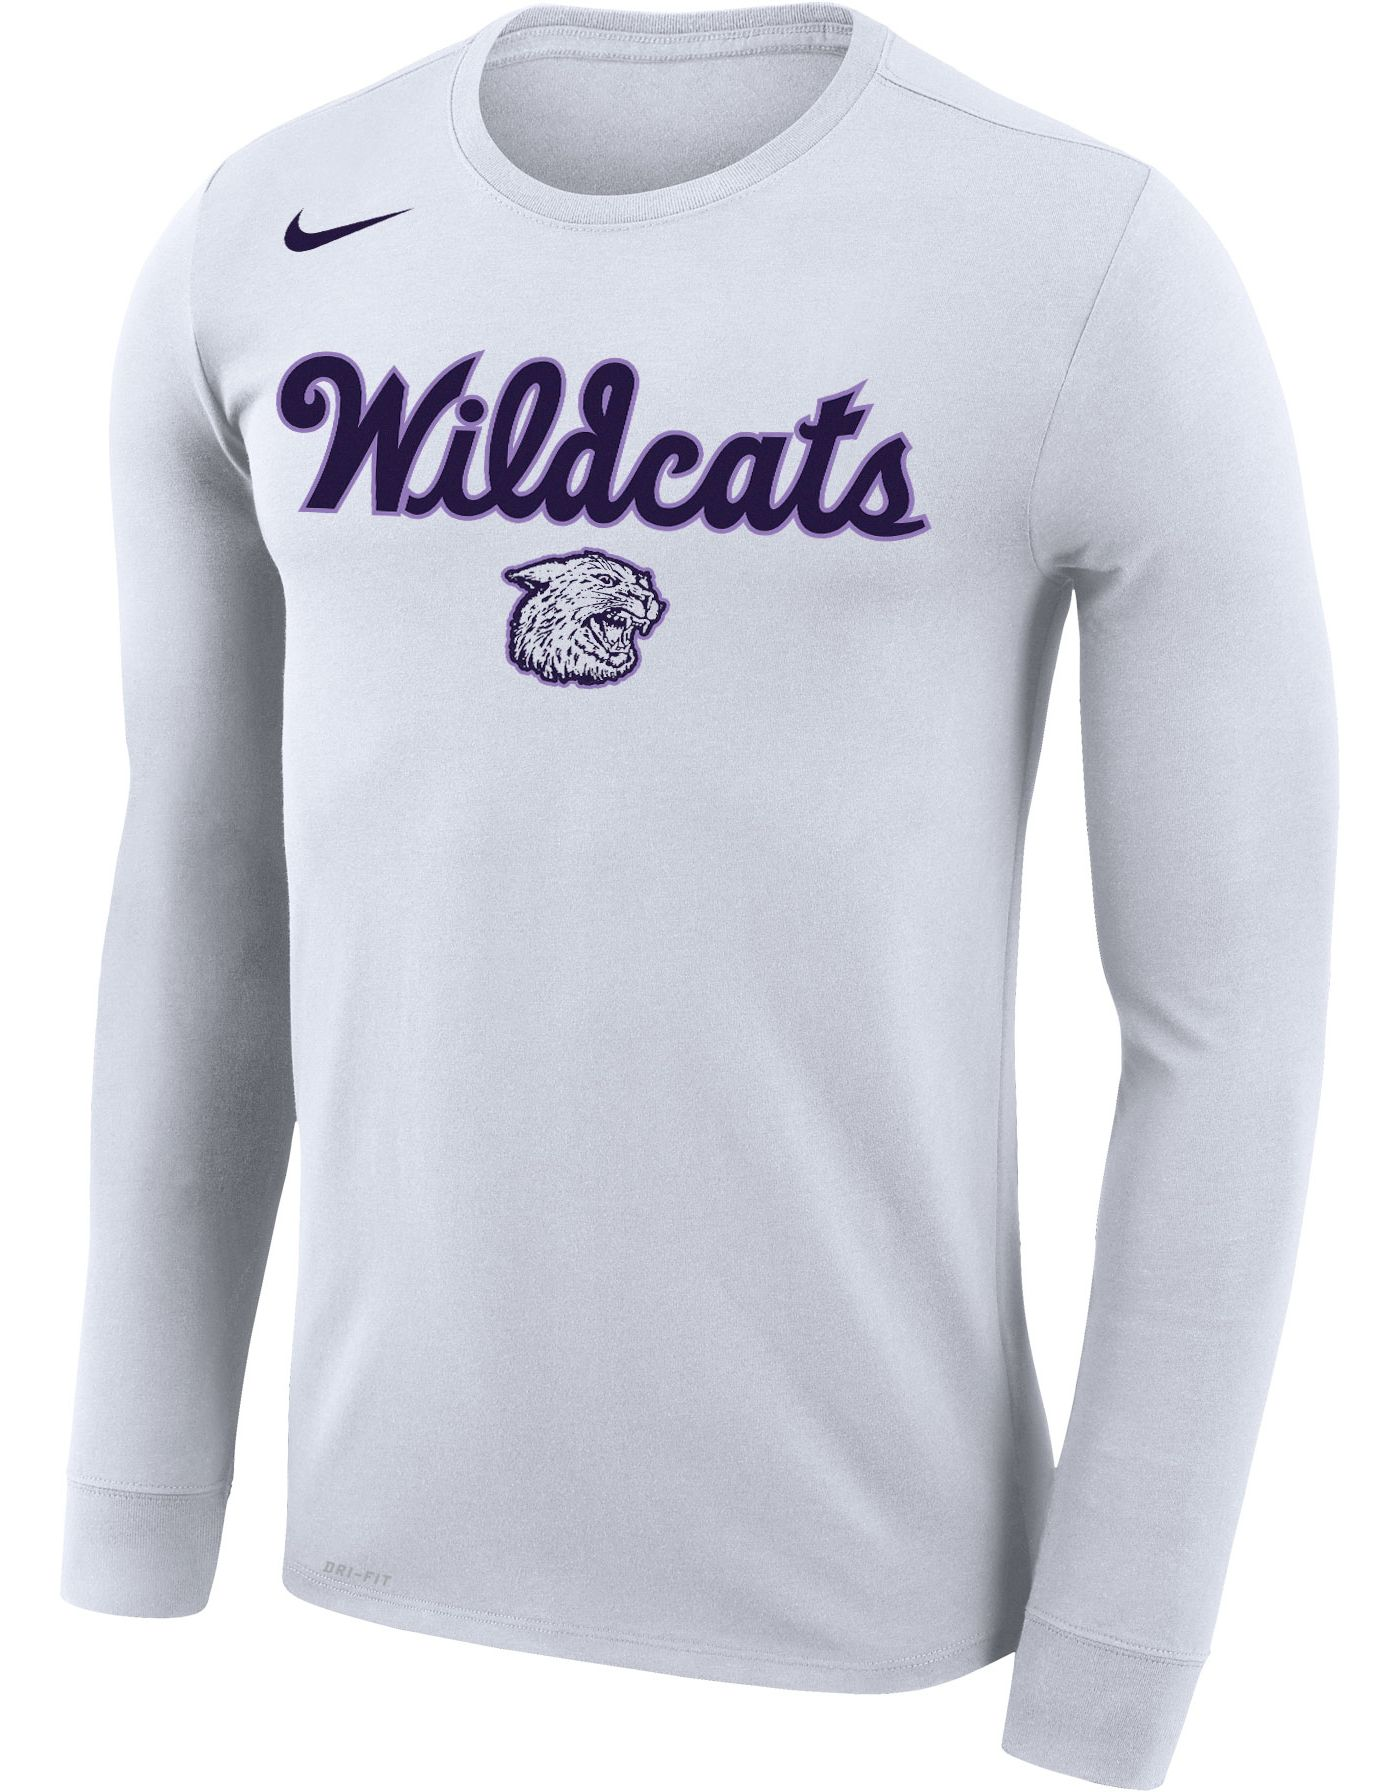 Nike Men's Kansas State Wildcats Dri-FIT Retro Basketball Long Sleeve White T-Shirt